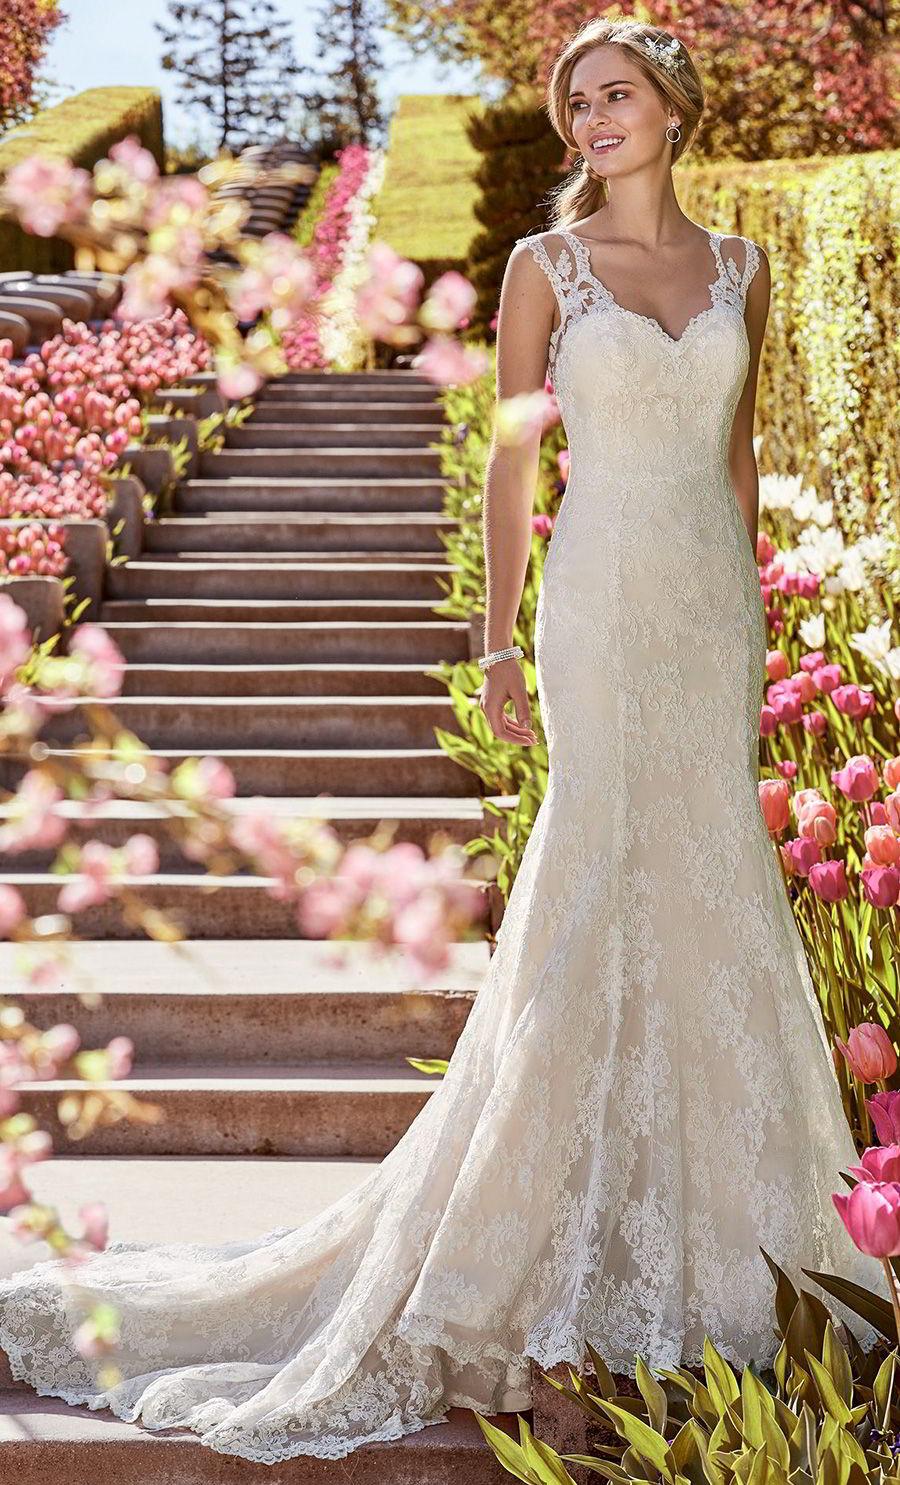 rebecca ingram 2018 gold wedding dresses (shirley) illusion cap sleeves sweetheart fit flare lace wedding dress mv elegant light gold color